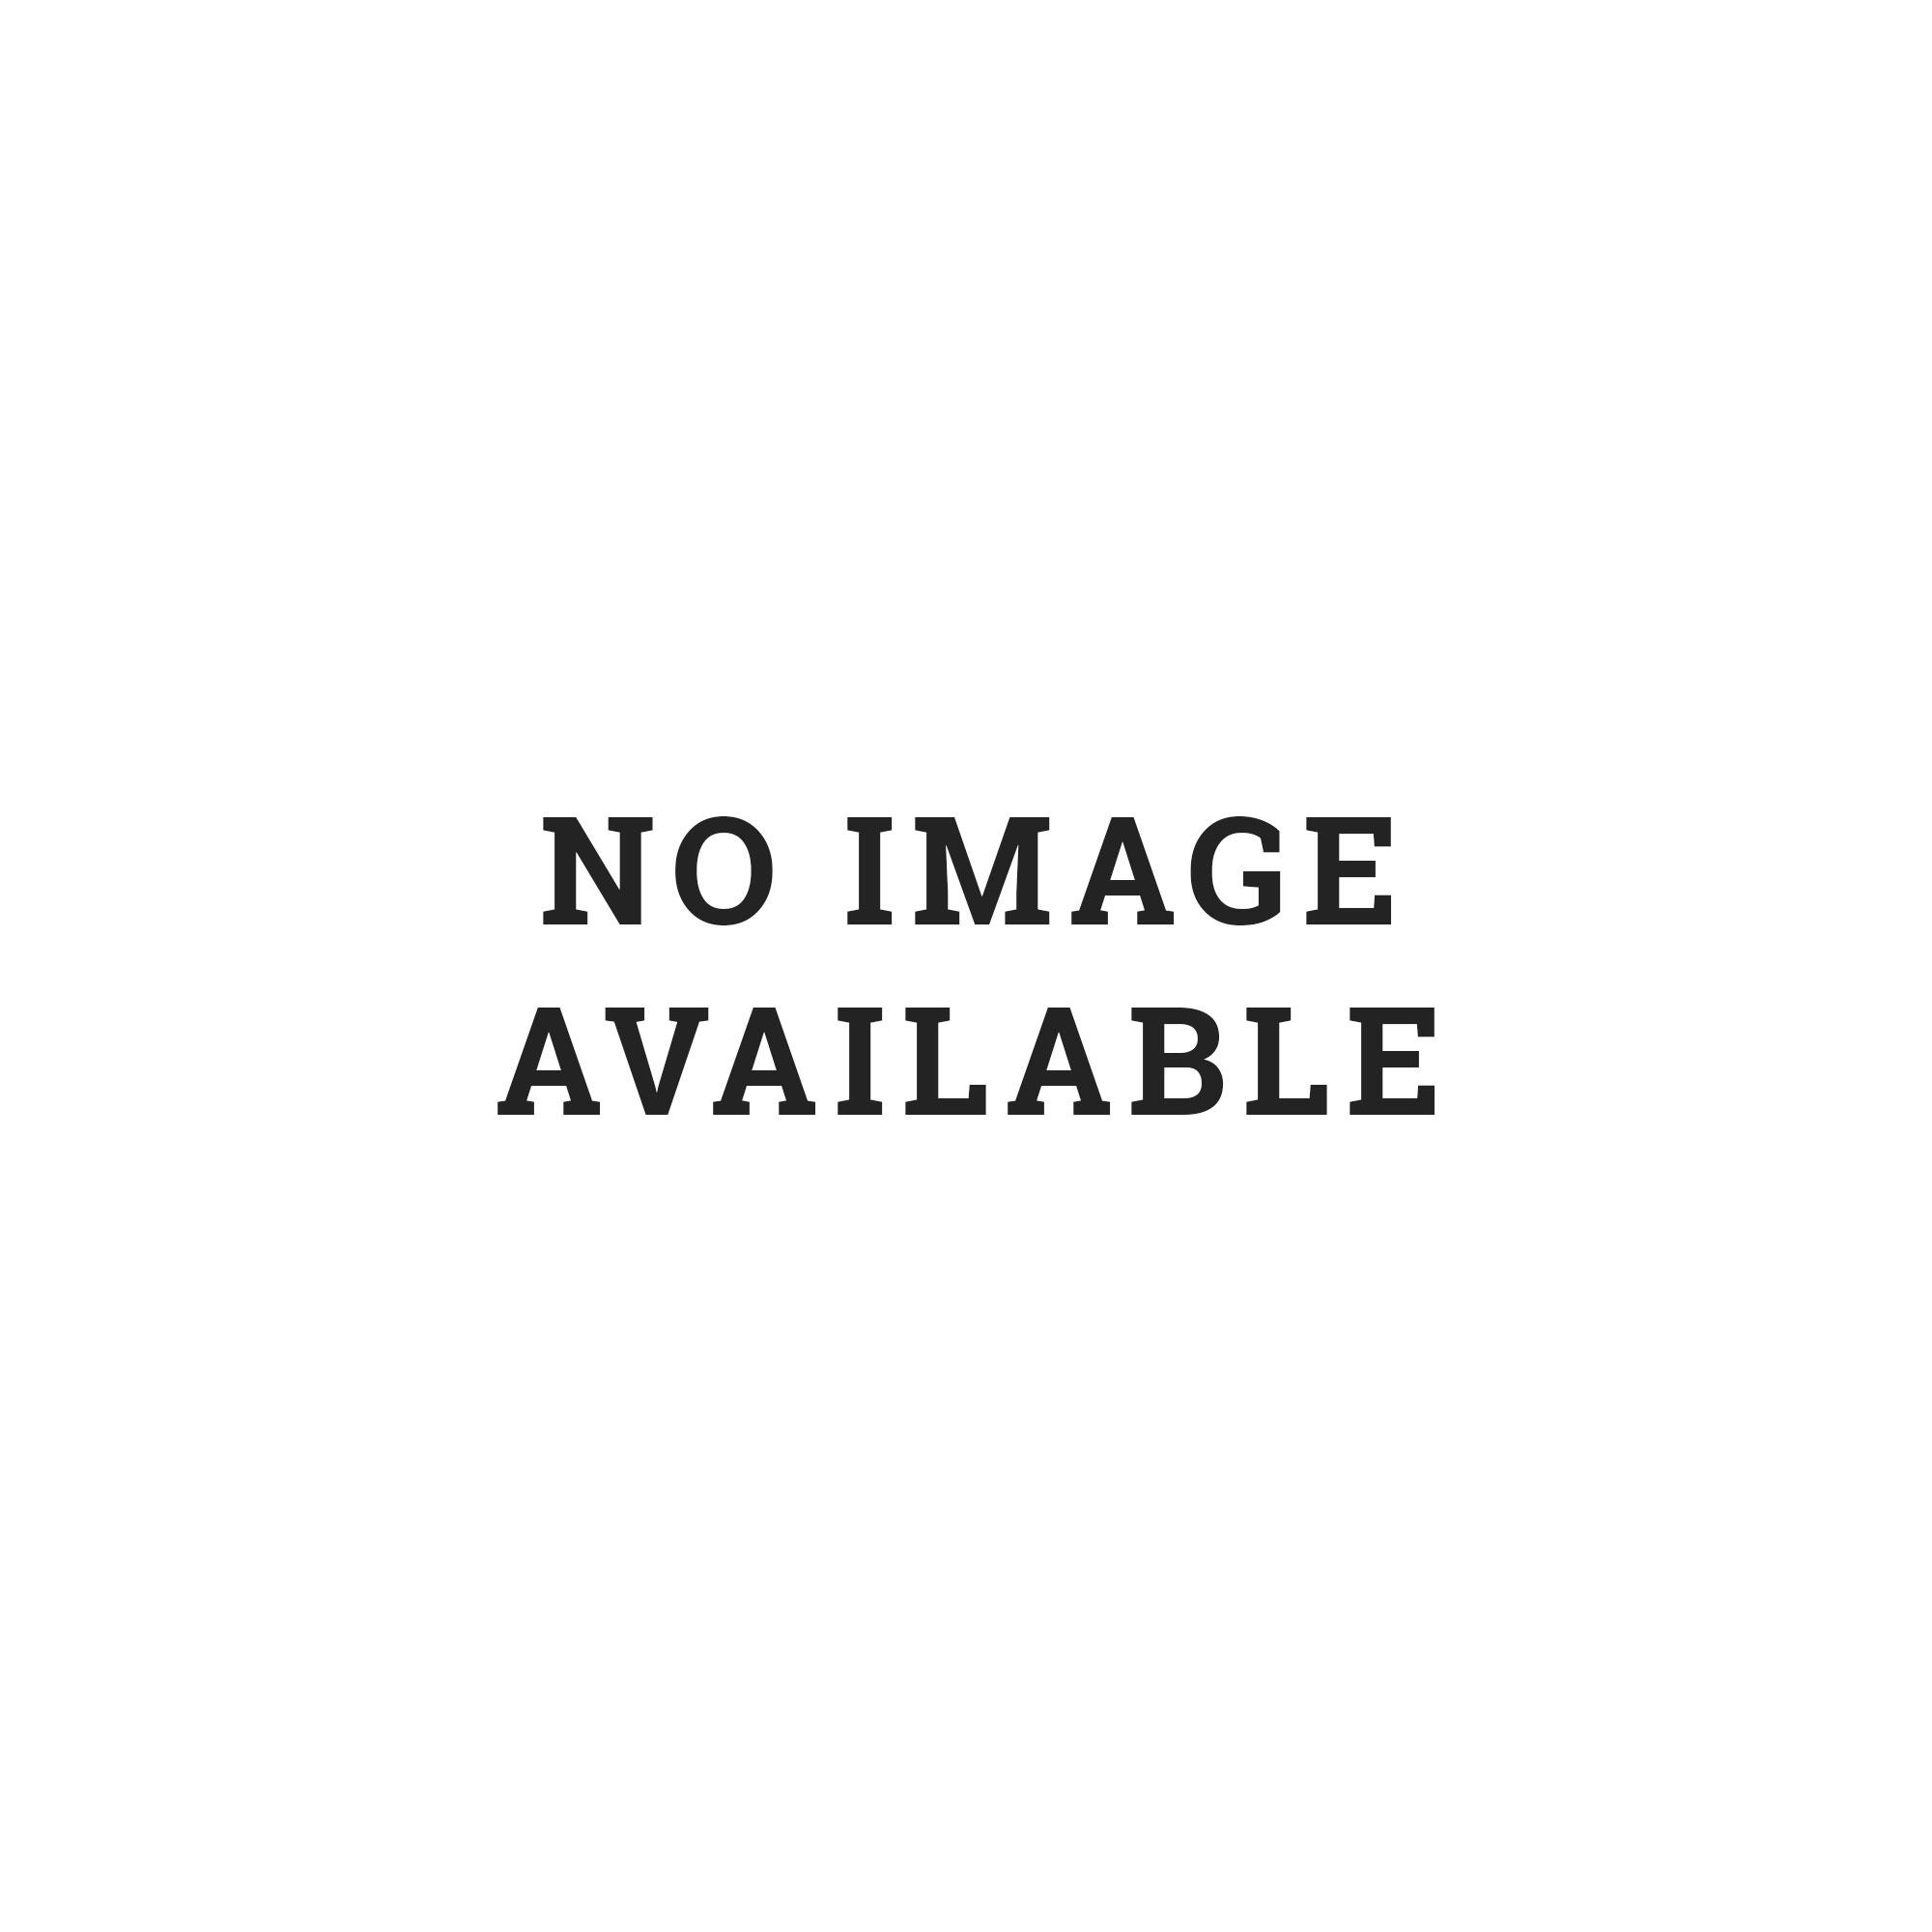 Converse 140033 C Chuck Taylor All Star Mens Oxford 6-Eyelet Long Lace-Up Shoes - Andorra Burgundy